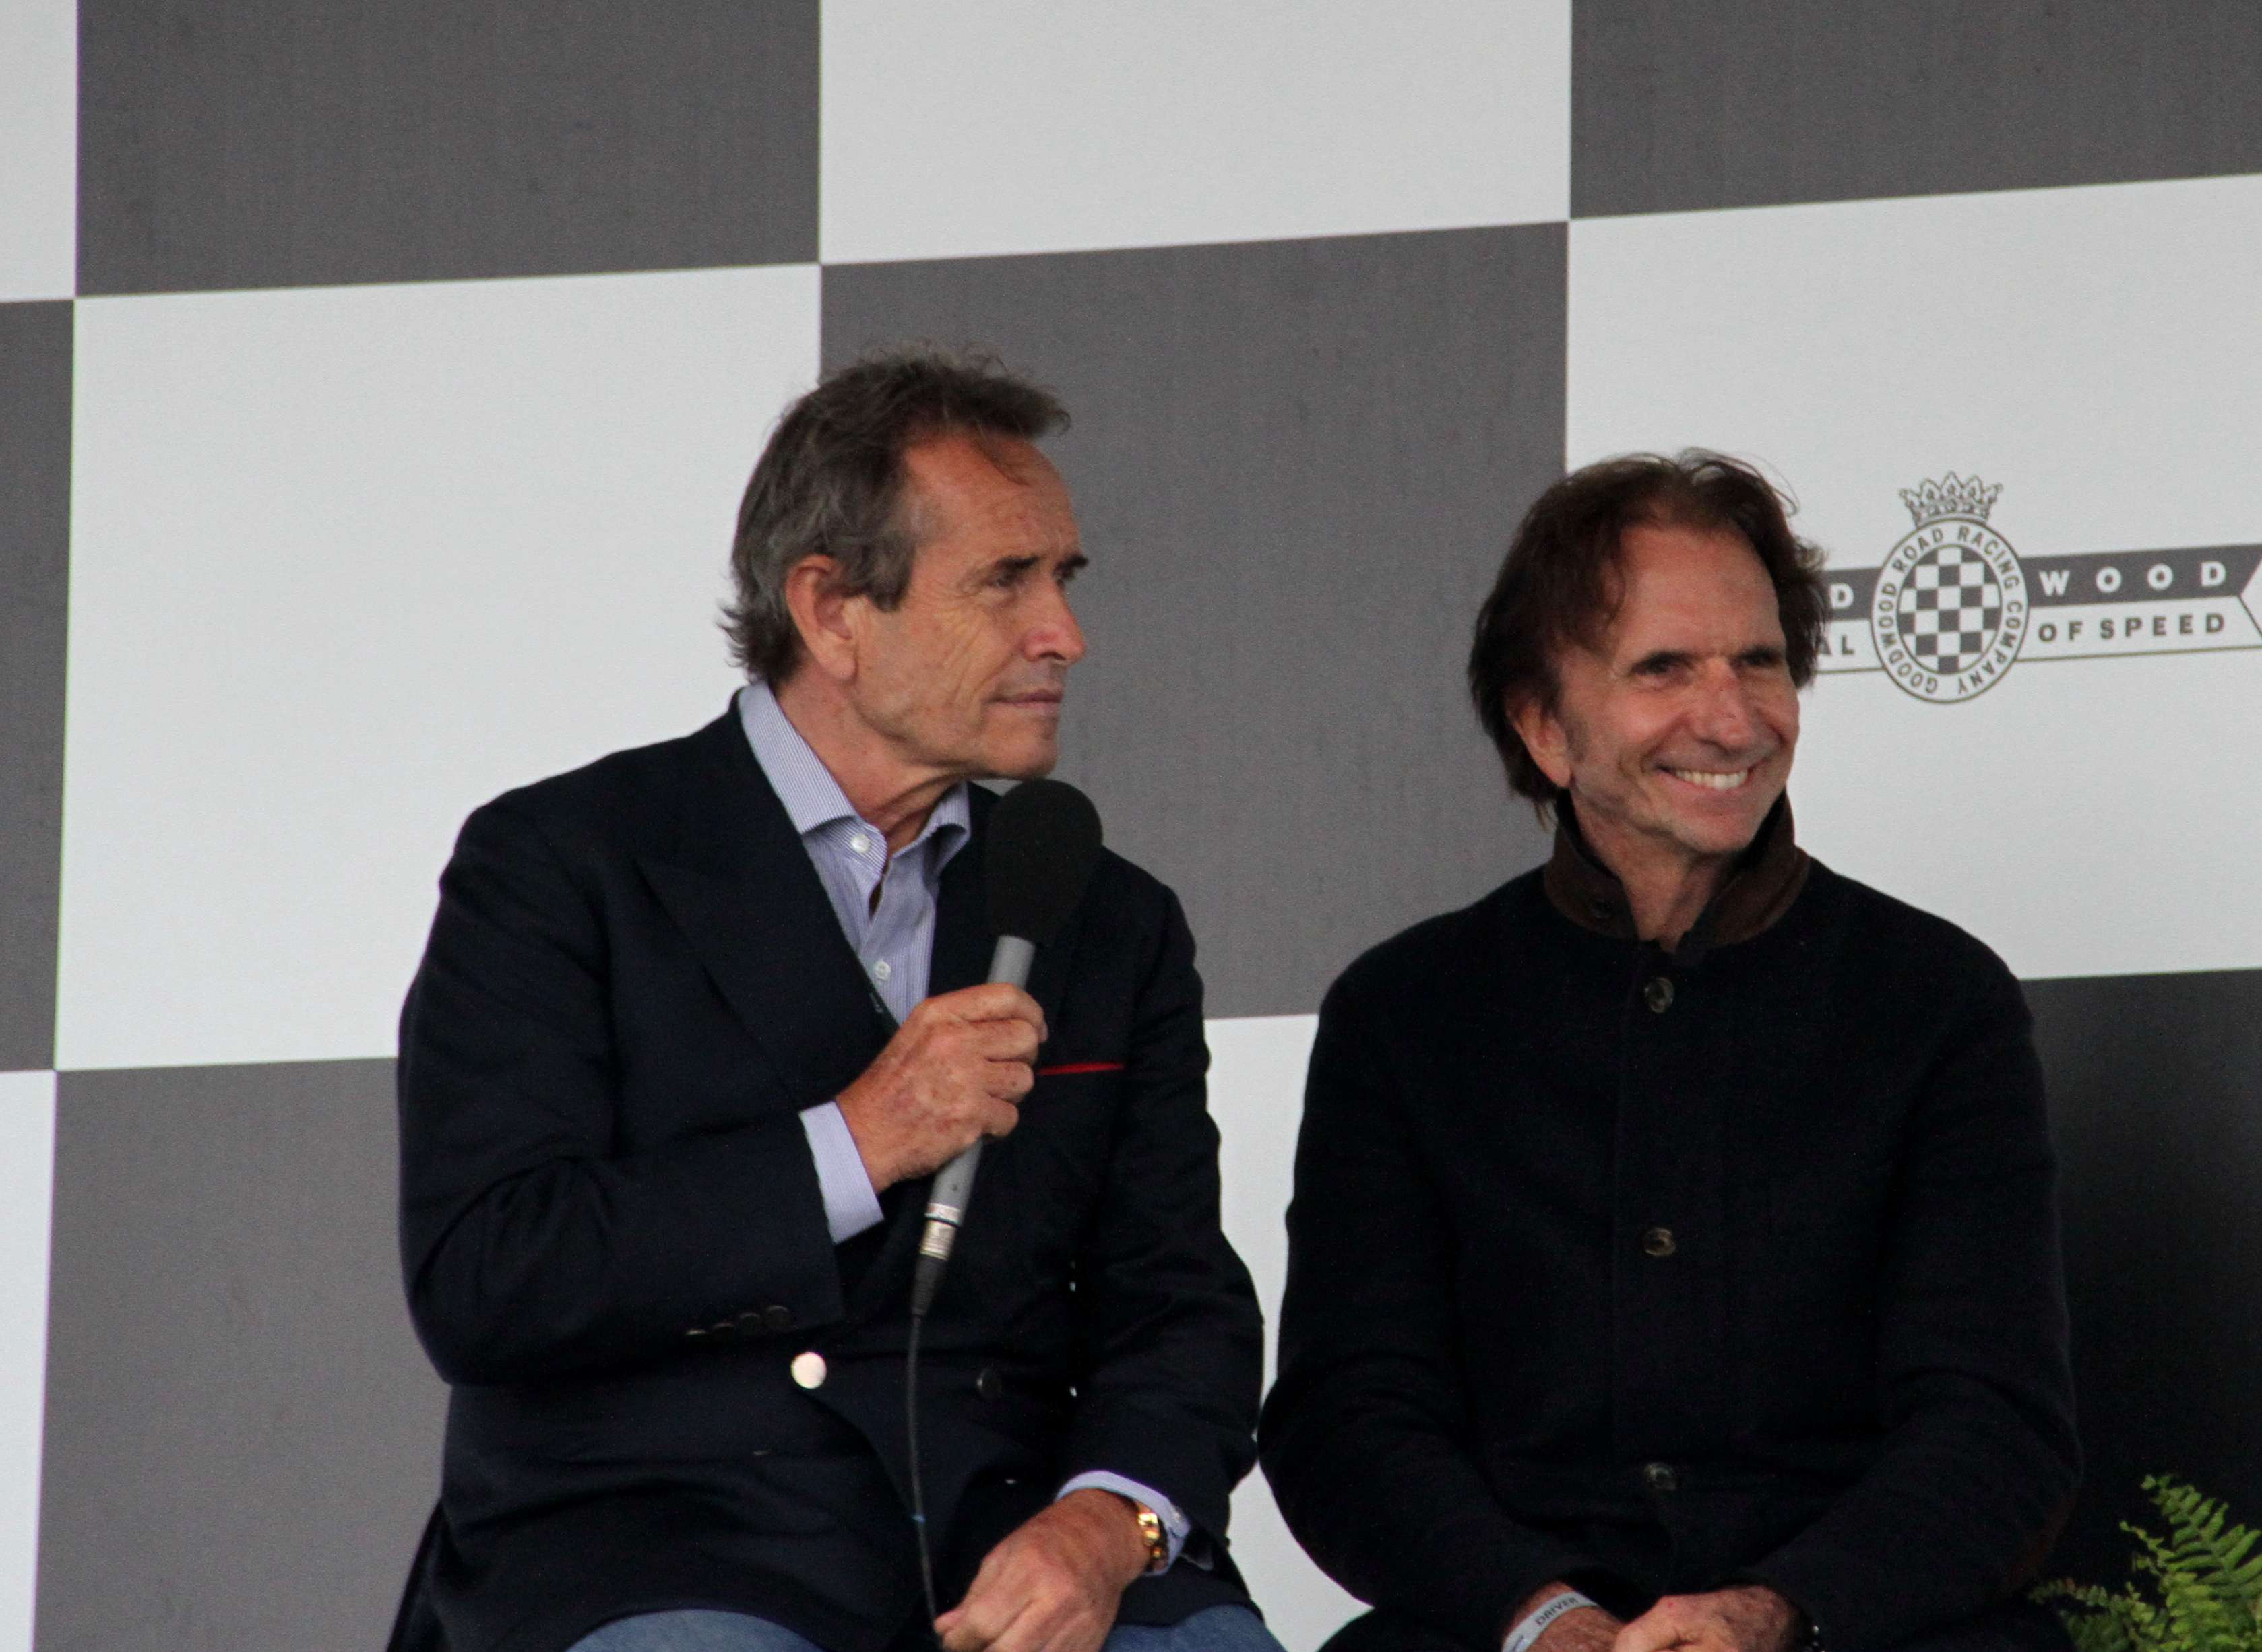 Emerson Fittipaldi Jacky Ickx